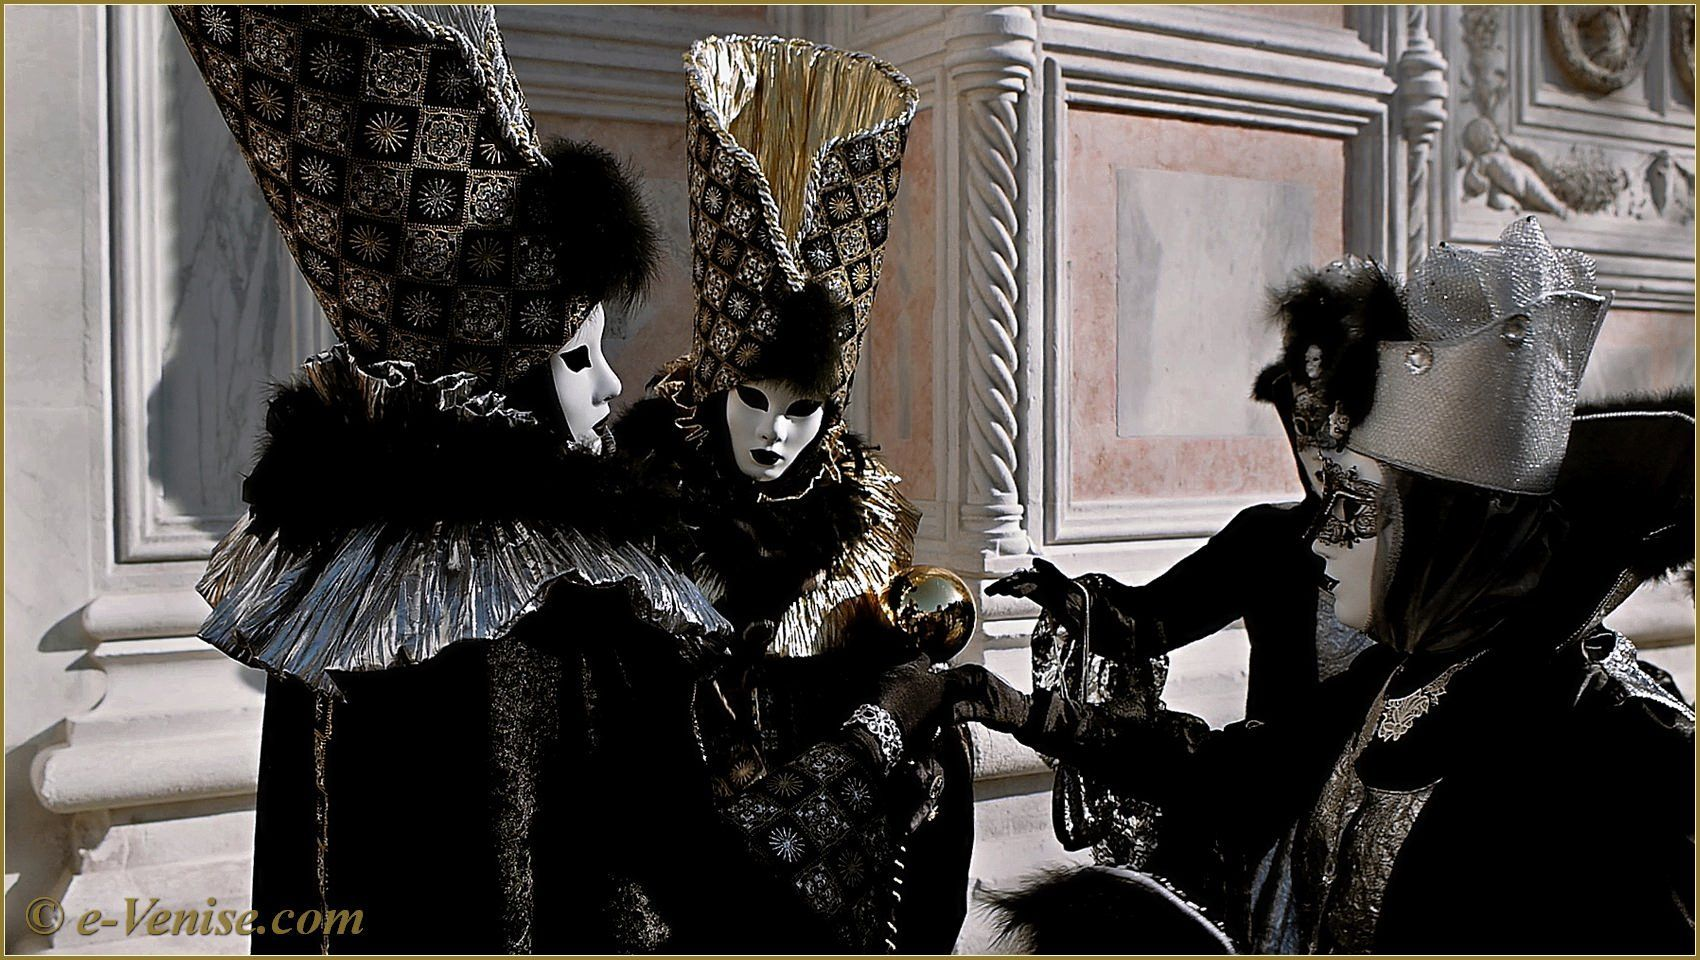 http://app.resrc.it/o=80/http://www.e-venise.com/pics/carnaval/2013/carnaval-venise-masques-2013-282.jpg